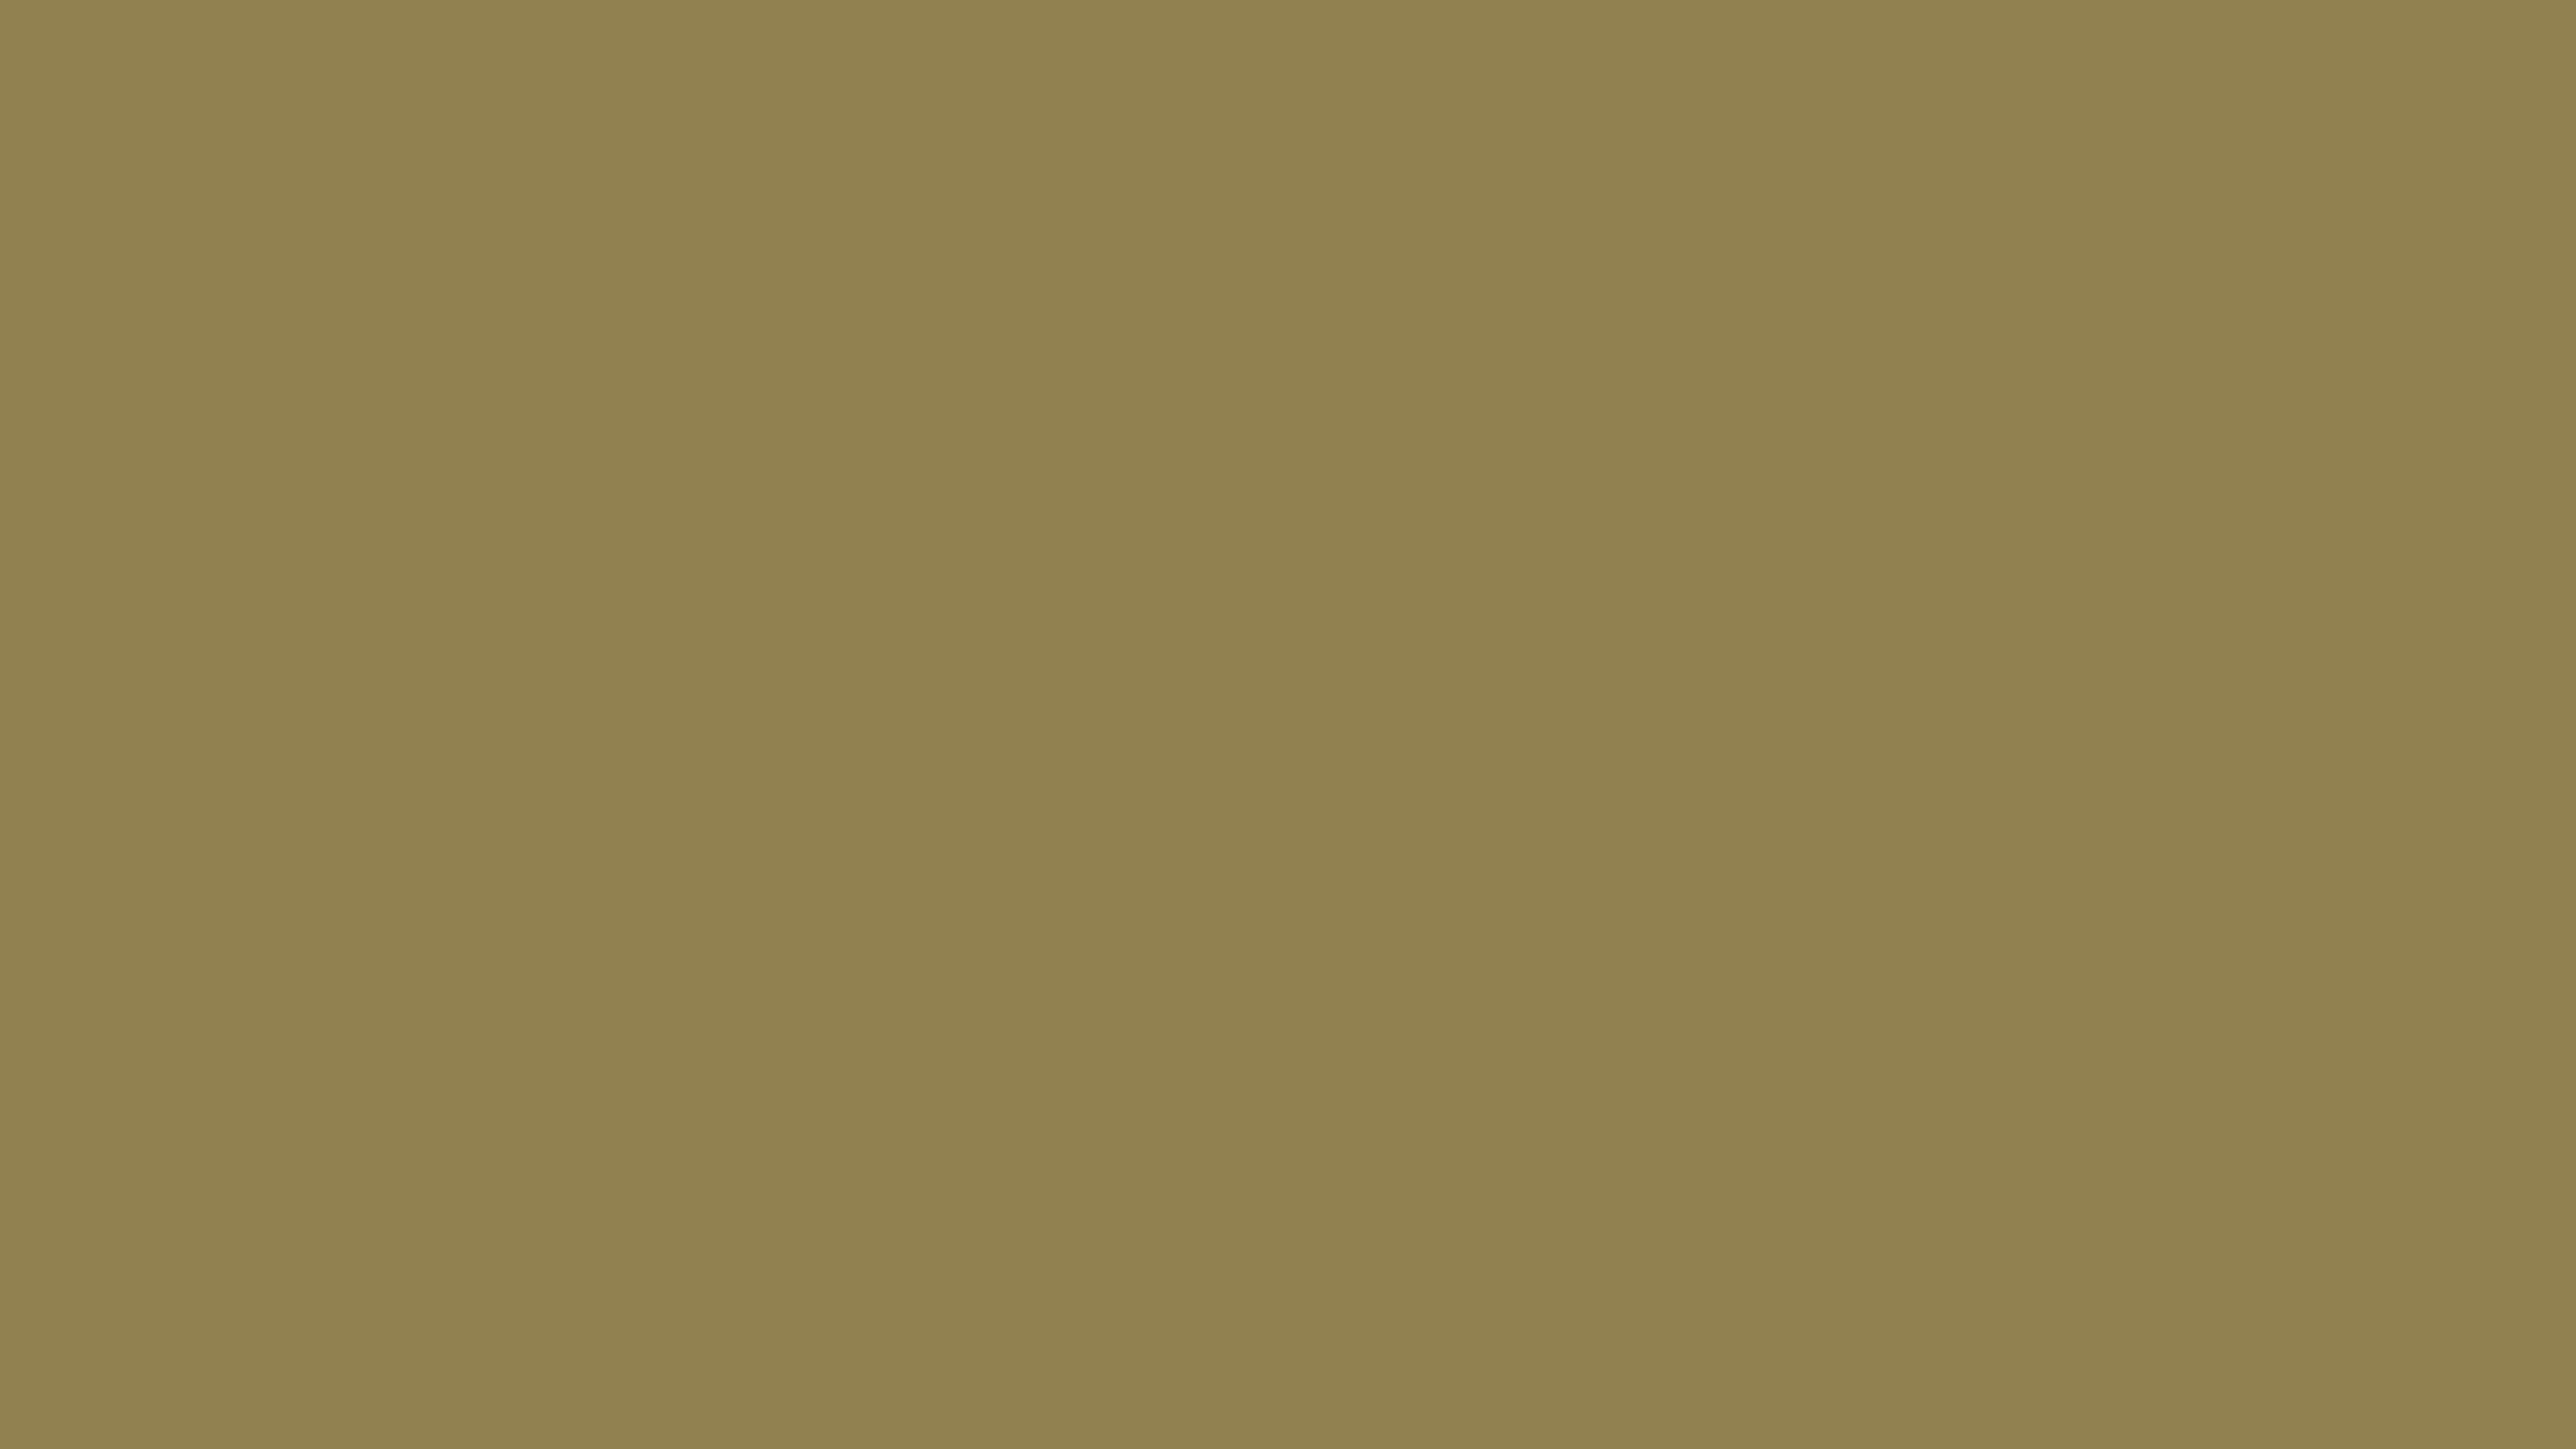 5120x2880 Dark Tan Solid Color Background